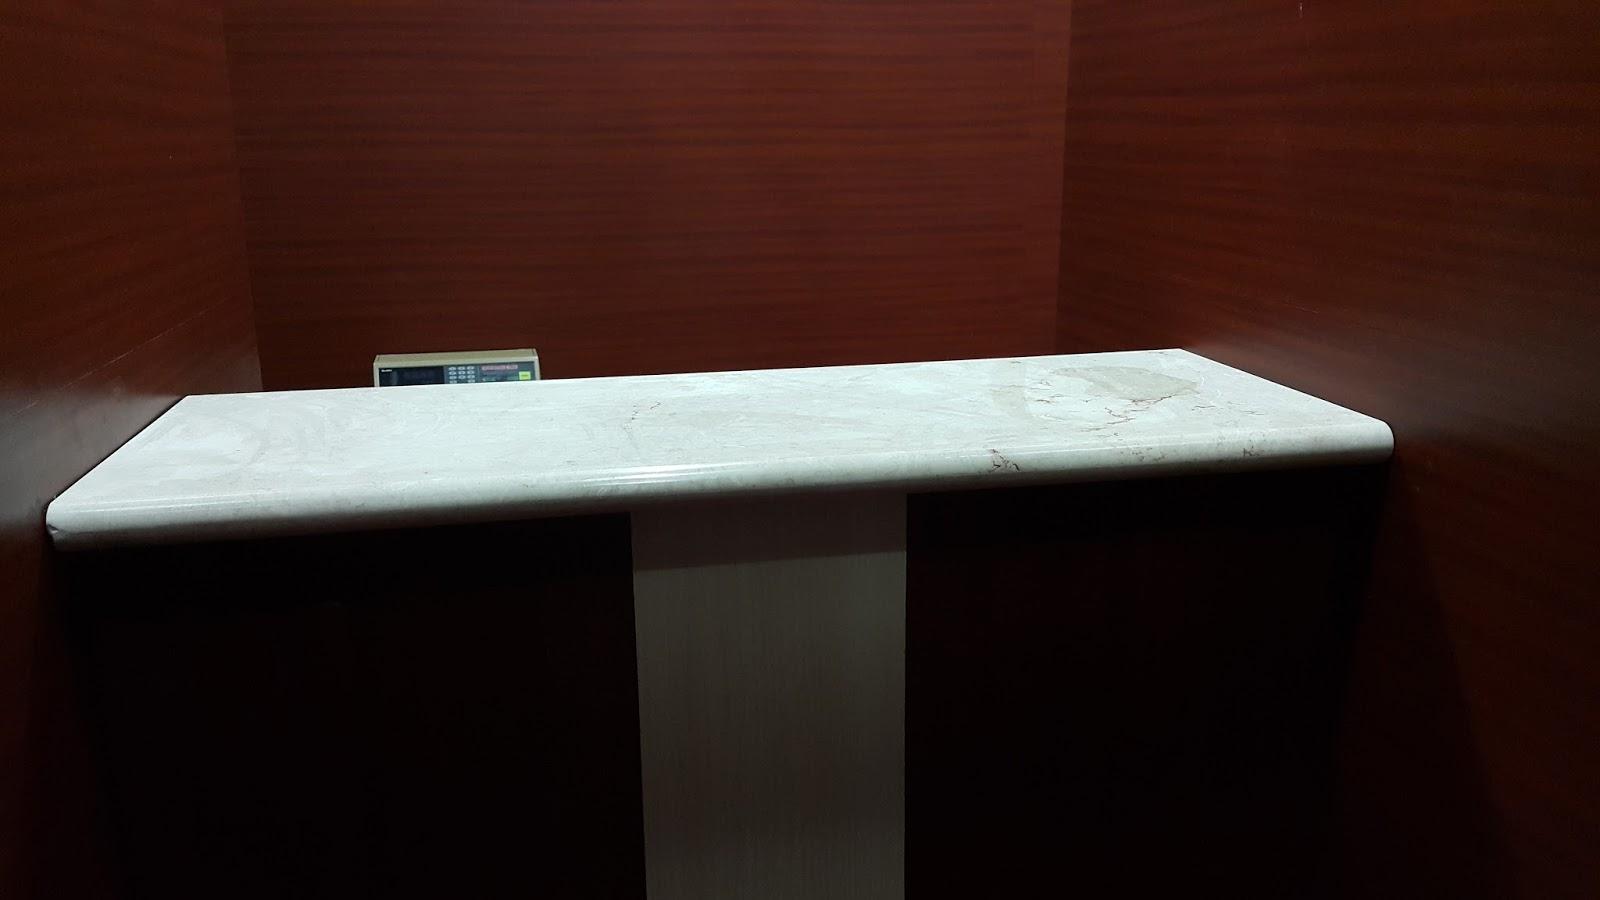 Top table surabaya sidoarjo gresik malang jember blitar banyuwangi